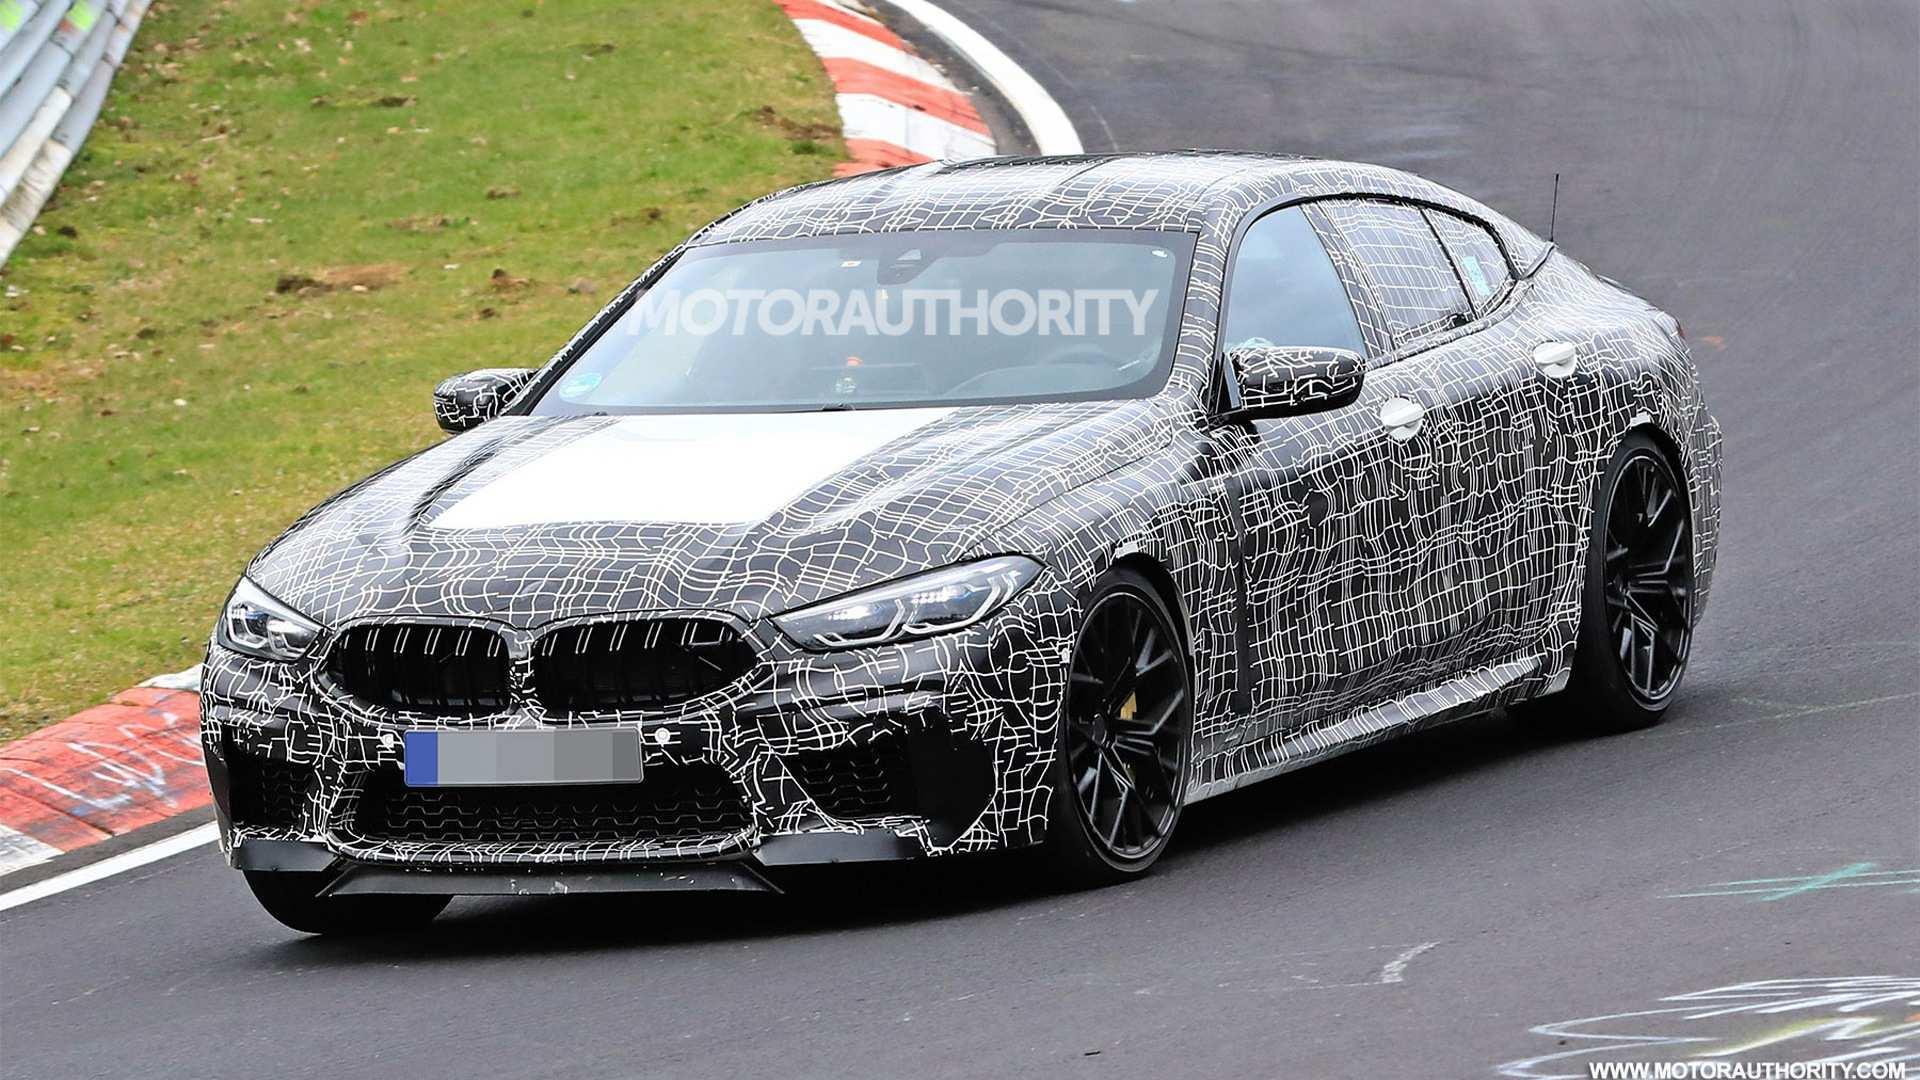 91 New BMW M6 2020 Pricing by BMW M6 2020